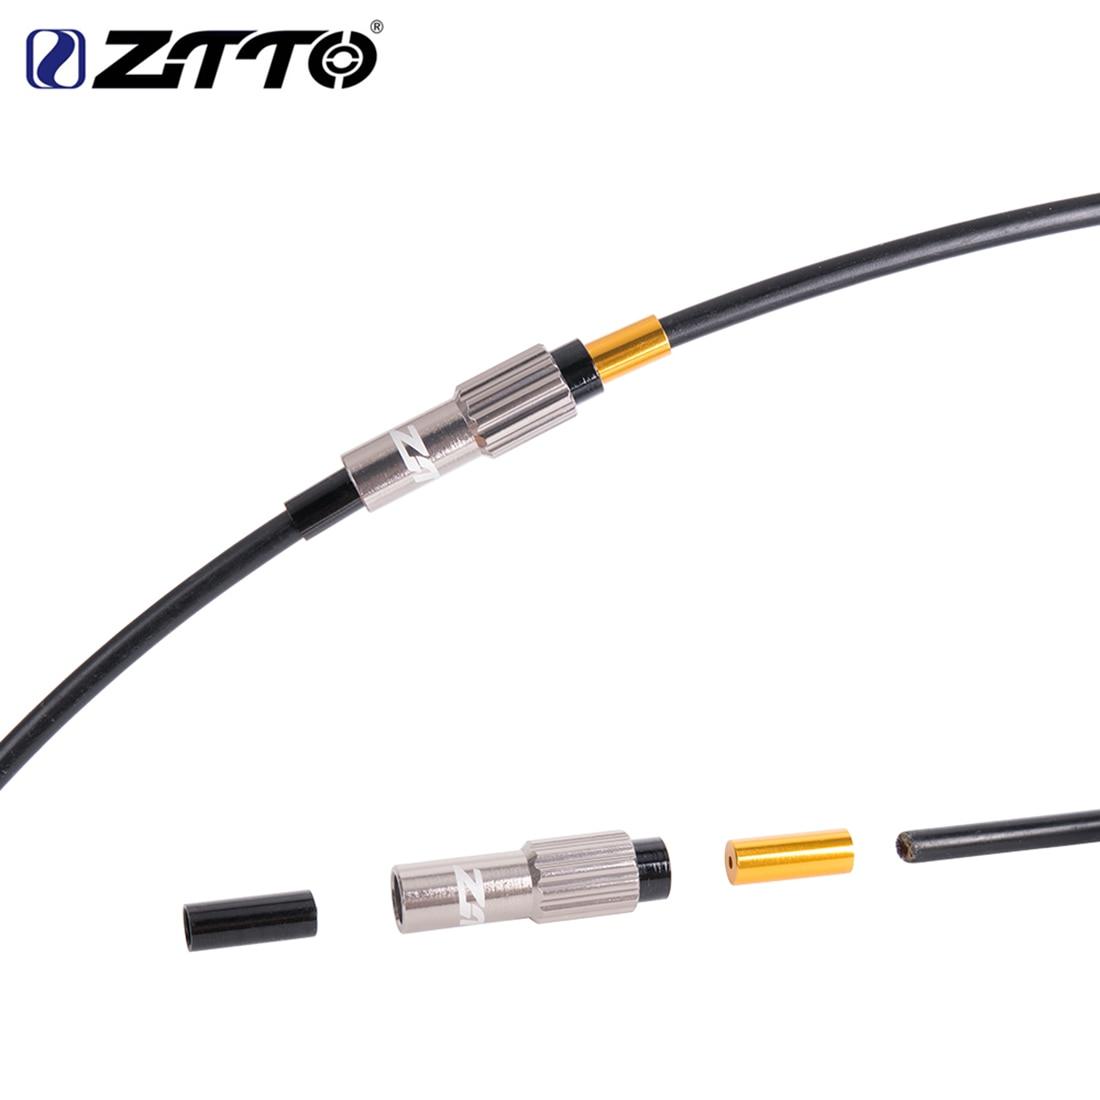 Ztto Light Alloy Cable Sets Mtb Mountain Road Bike V Brake